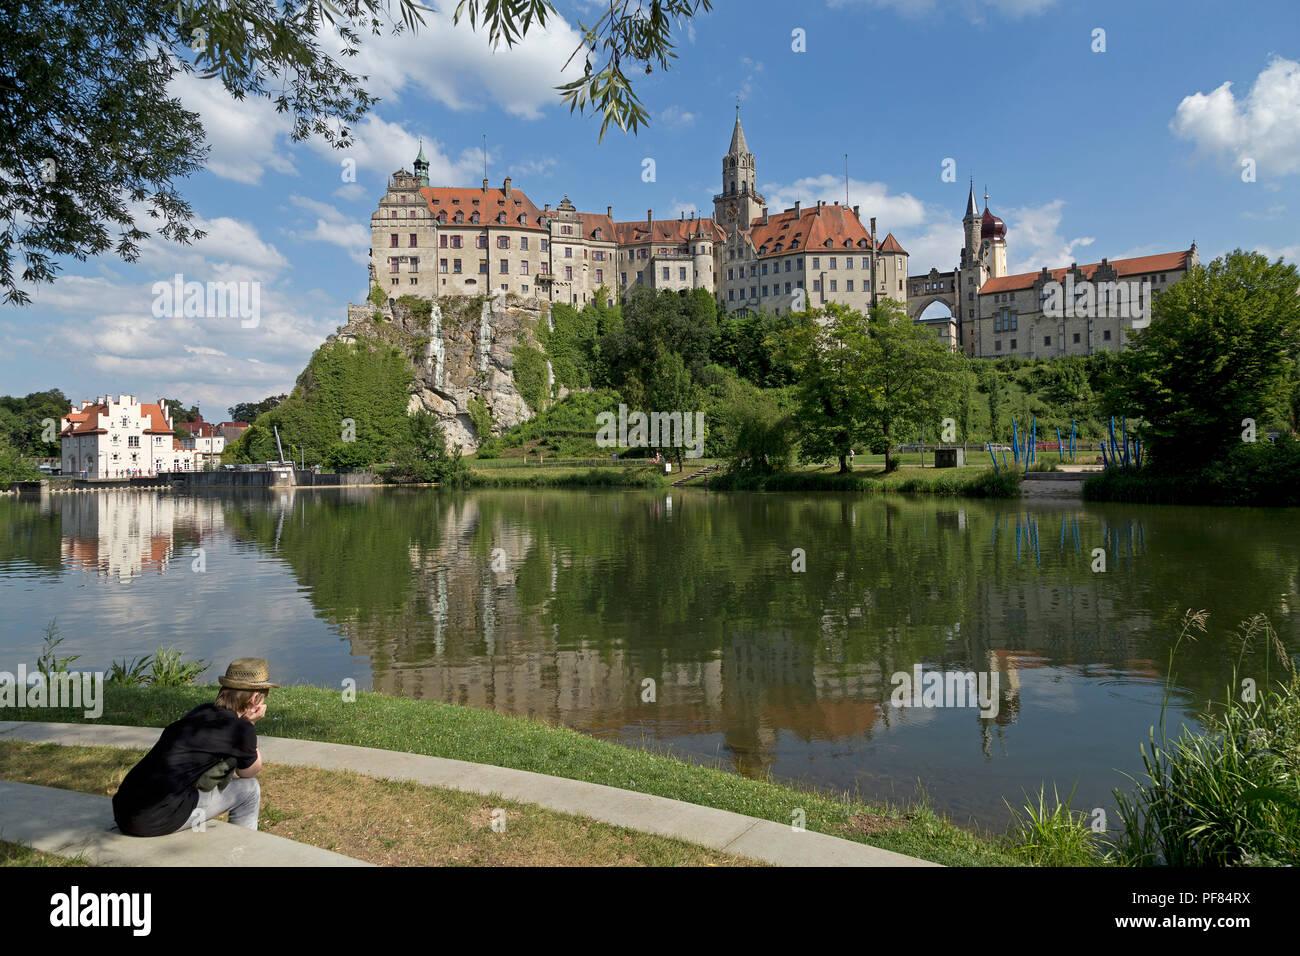 castle and River Danube, Sigmaringen, Baden-Wuerttemberg, Germany - Stock Image